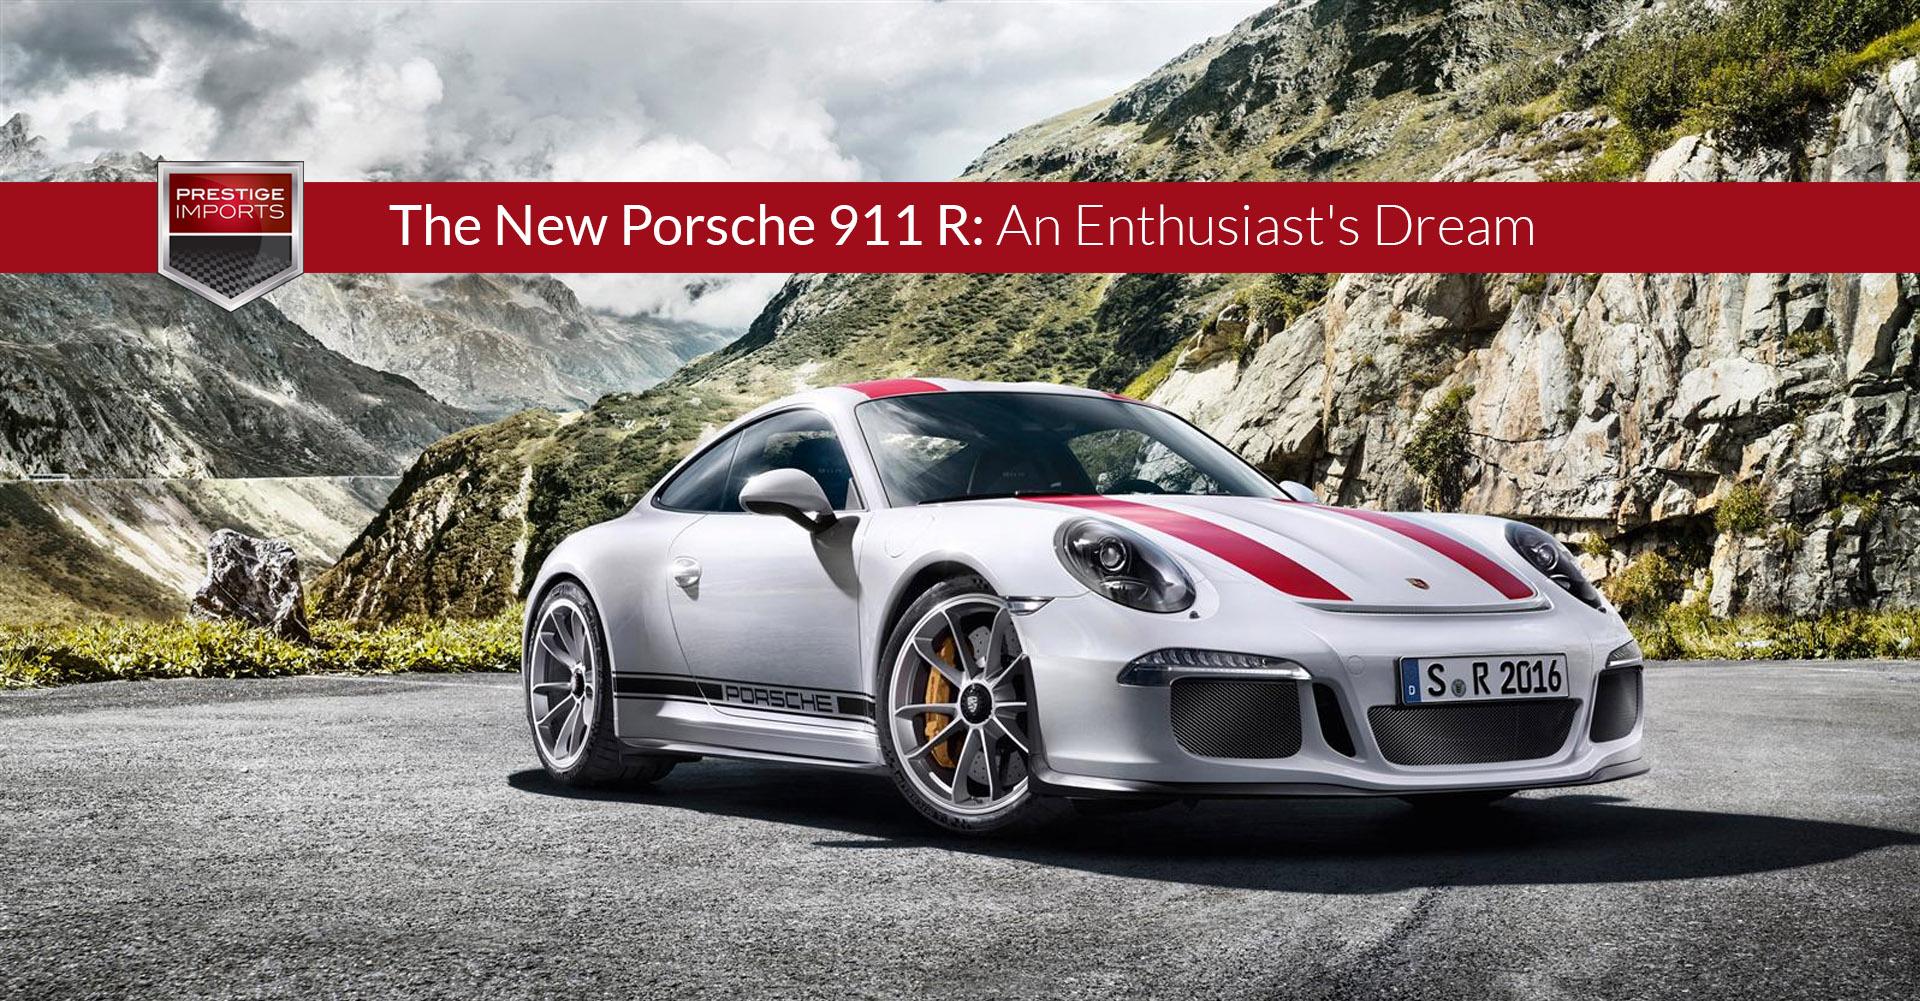 The New Porsche 911 R An Enthusiast s Dream